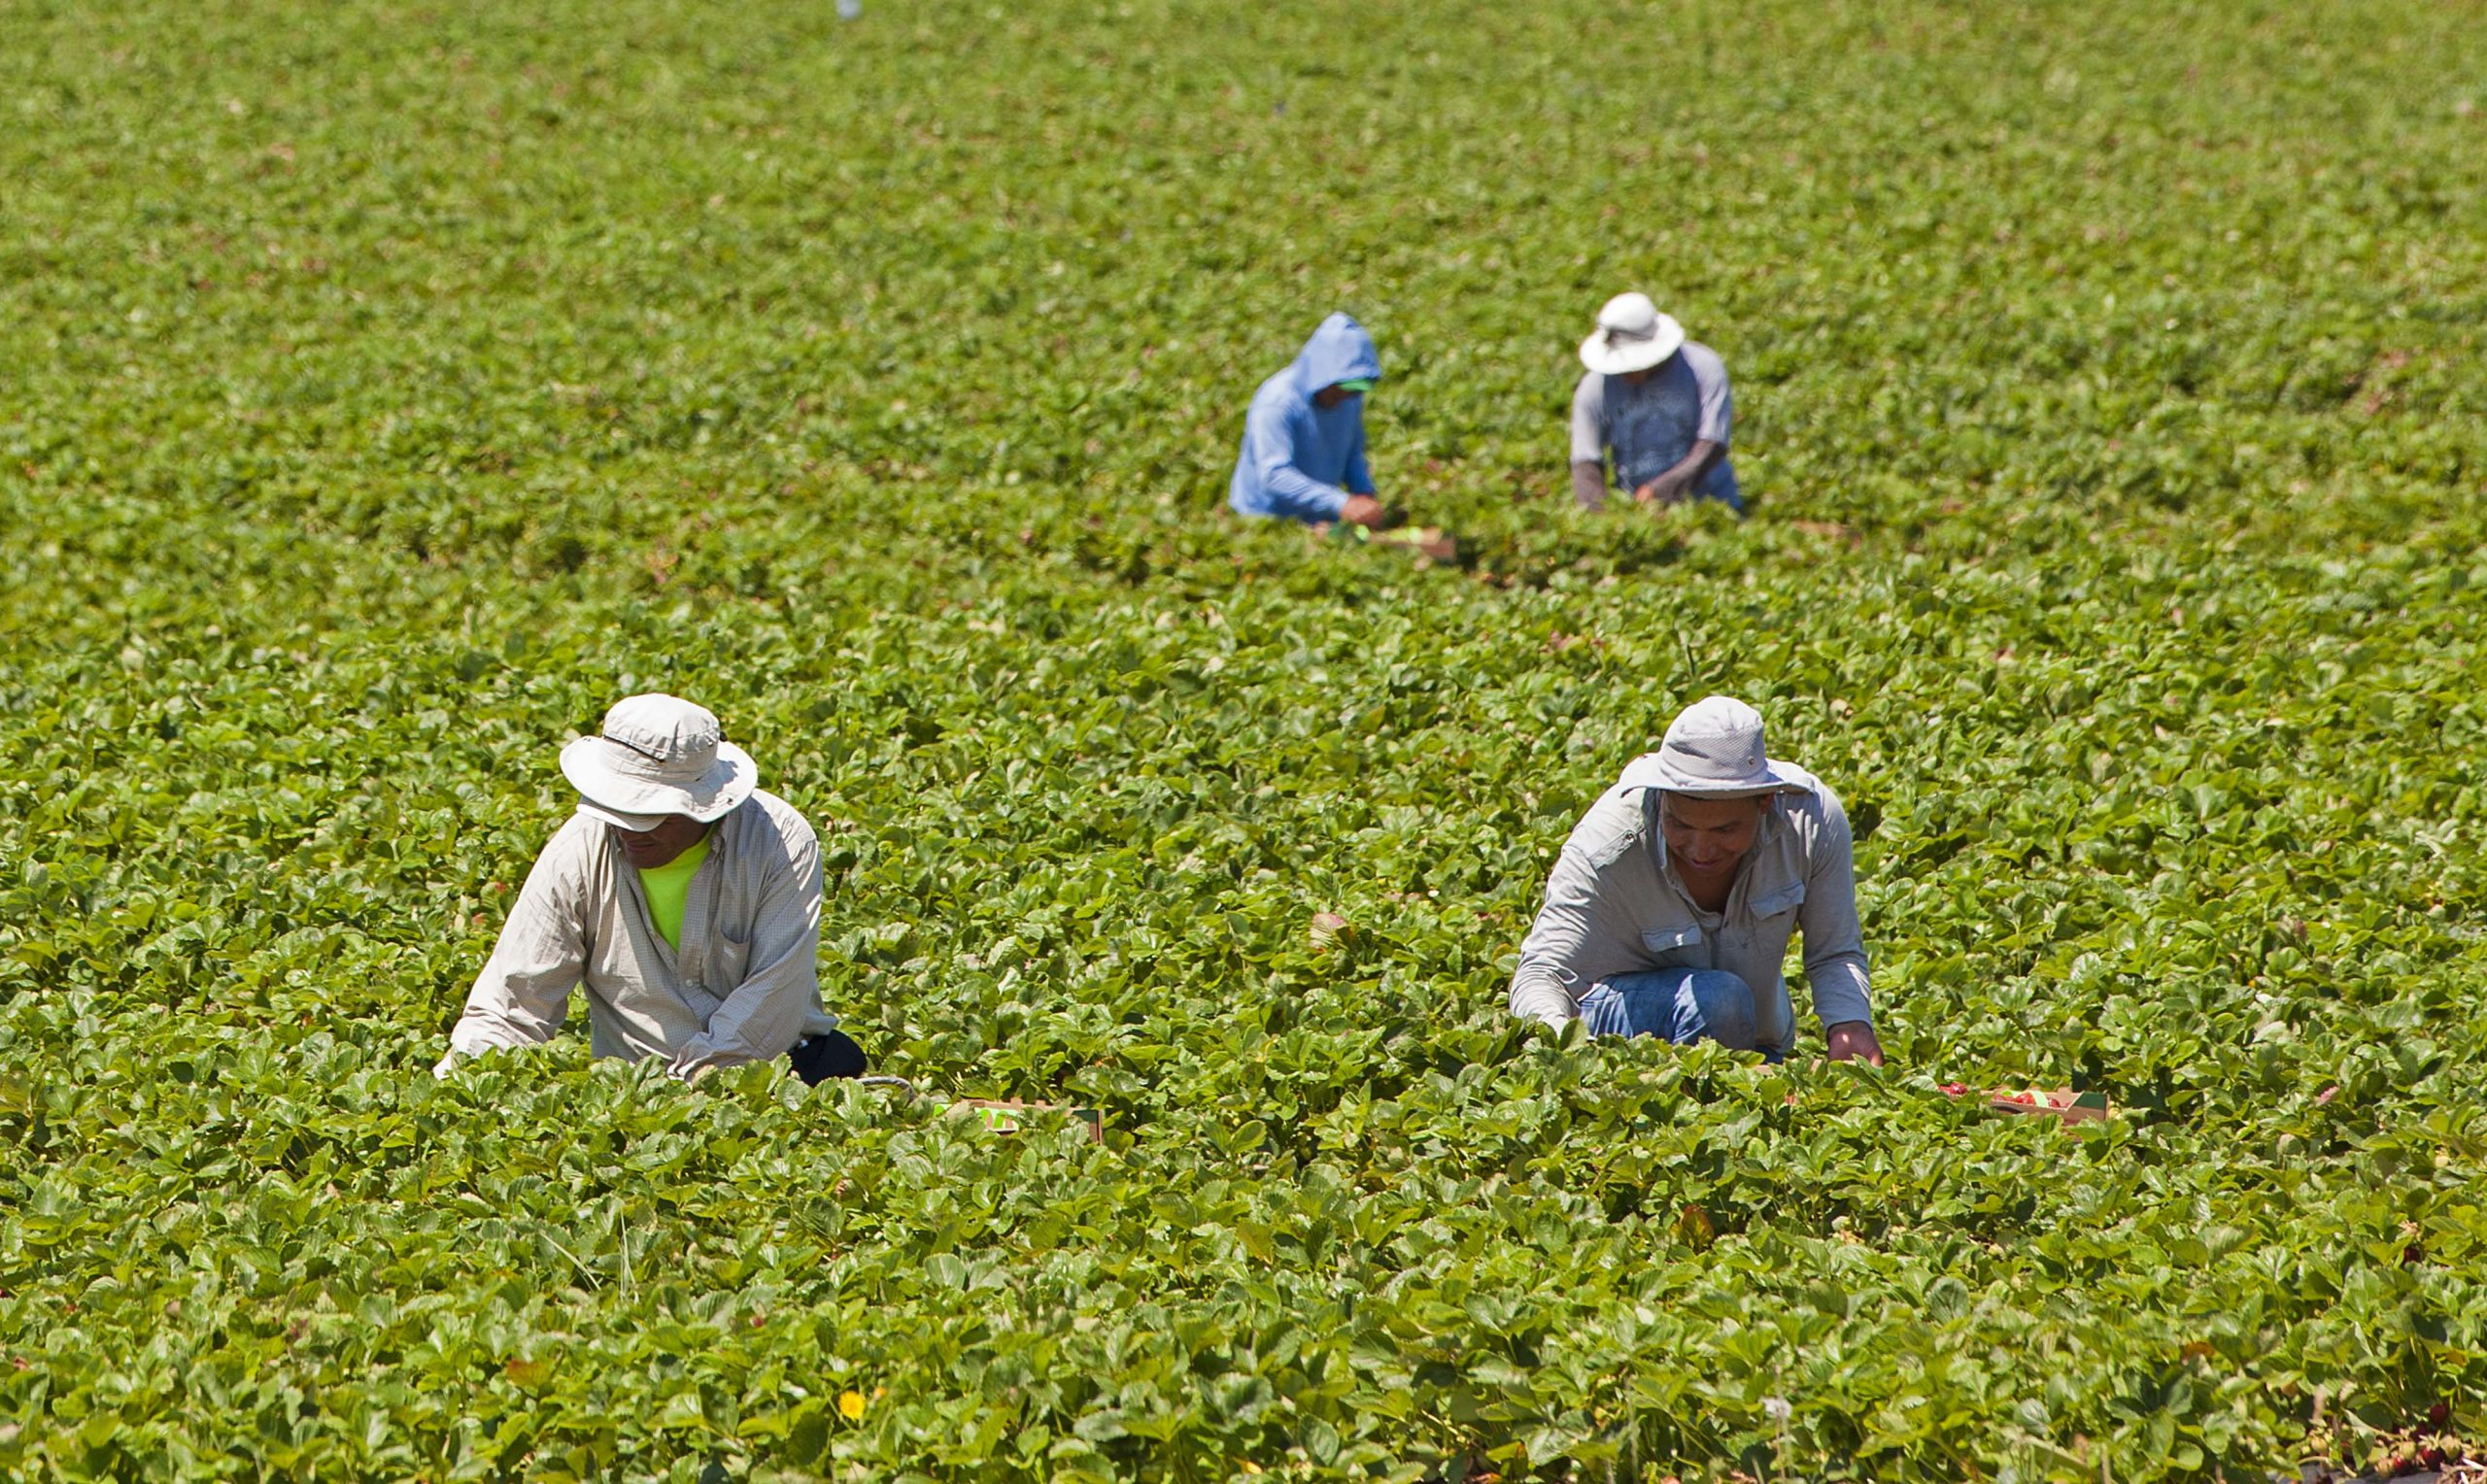 Farmworkers in the field